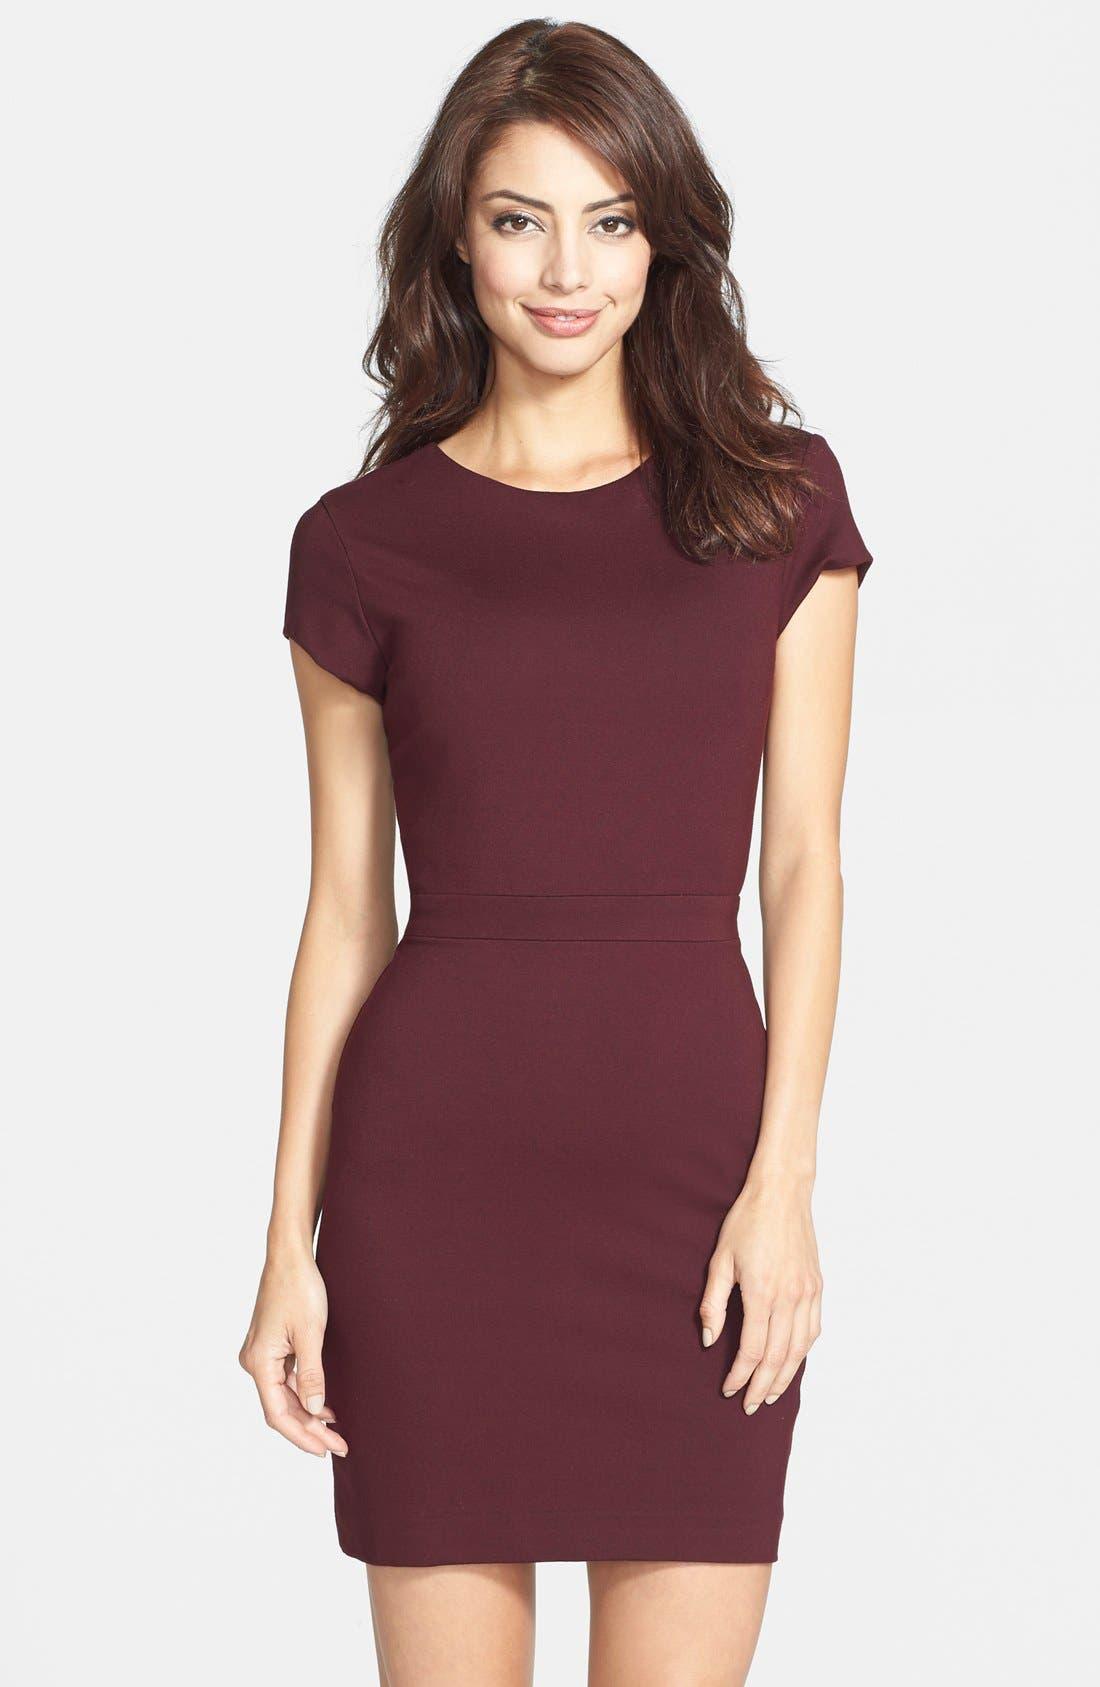 Alternate Image 1 Selected - Nicole Miller Open Back Ponte Body-Con Dress